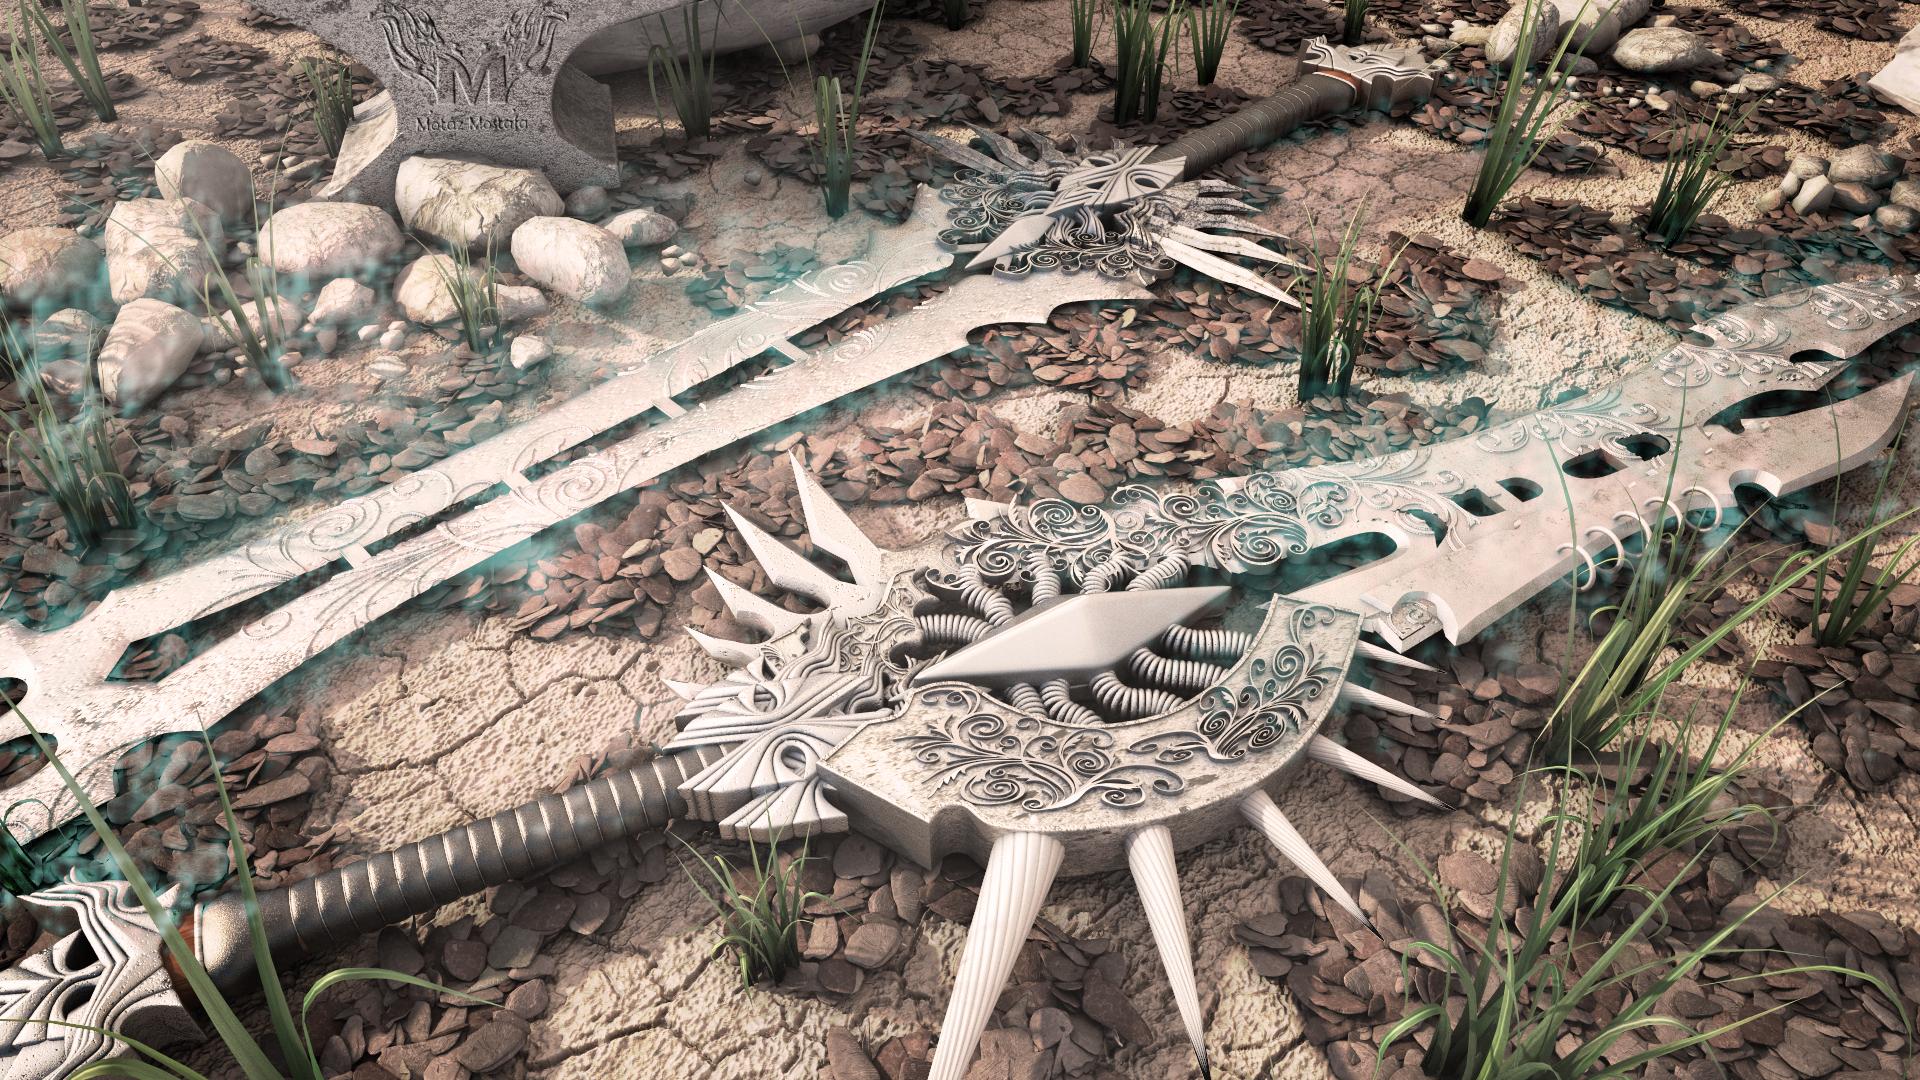 Swords 3D Modeling